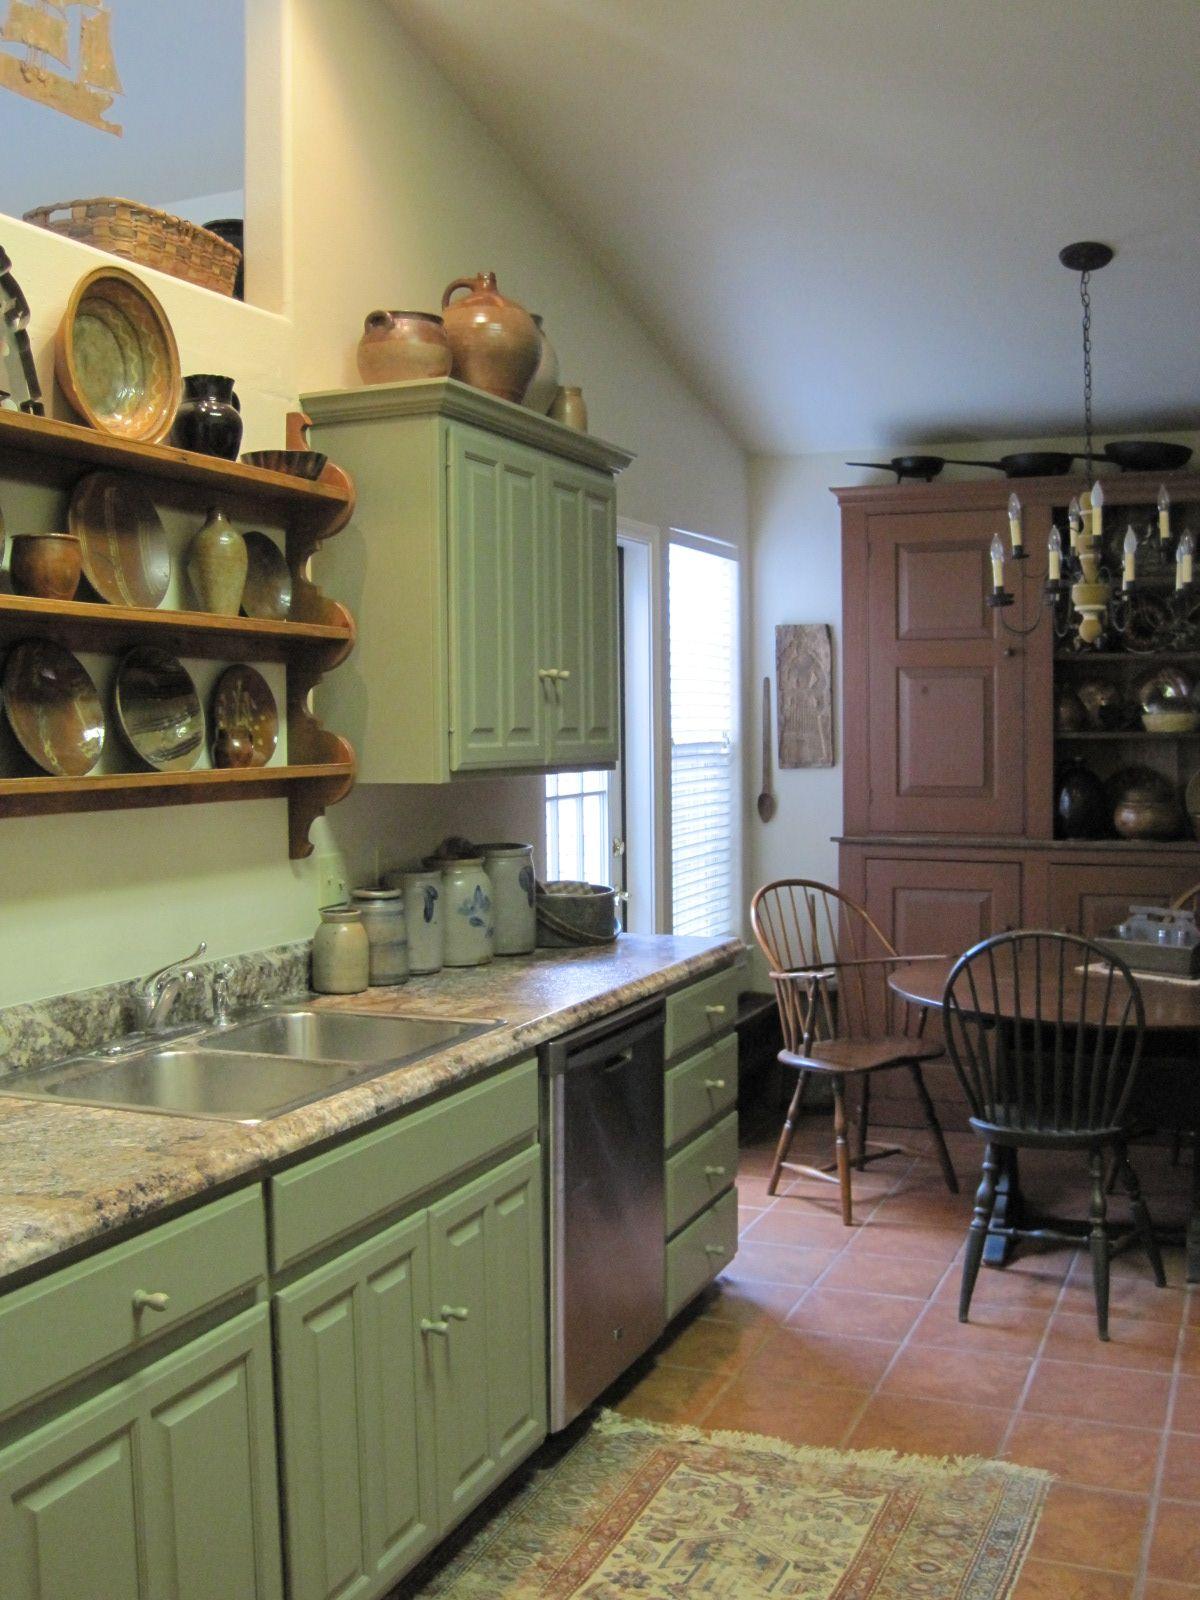 FARMHOUSE - INTERIOR - vintage early american farmhouse ...